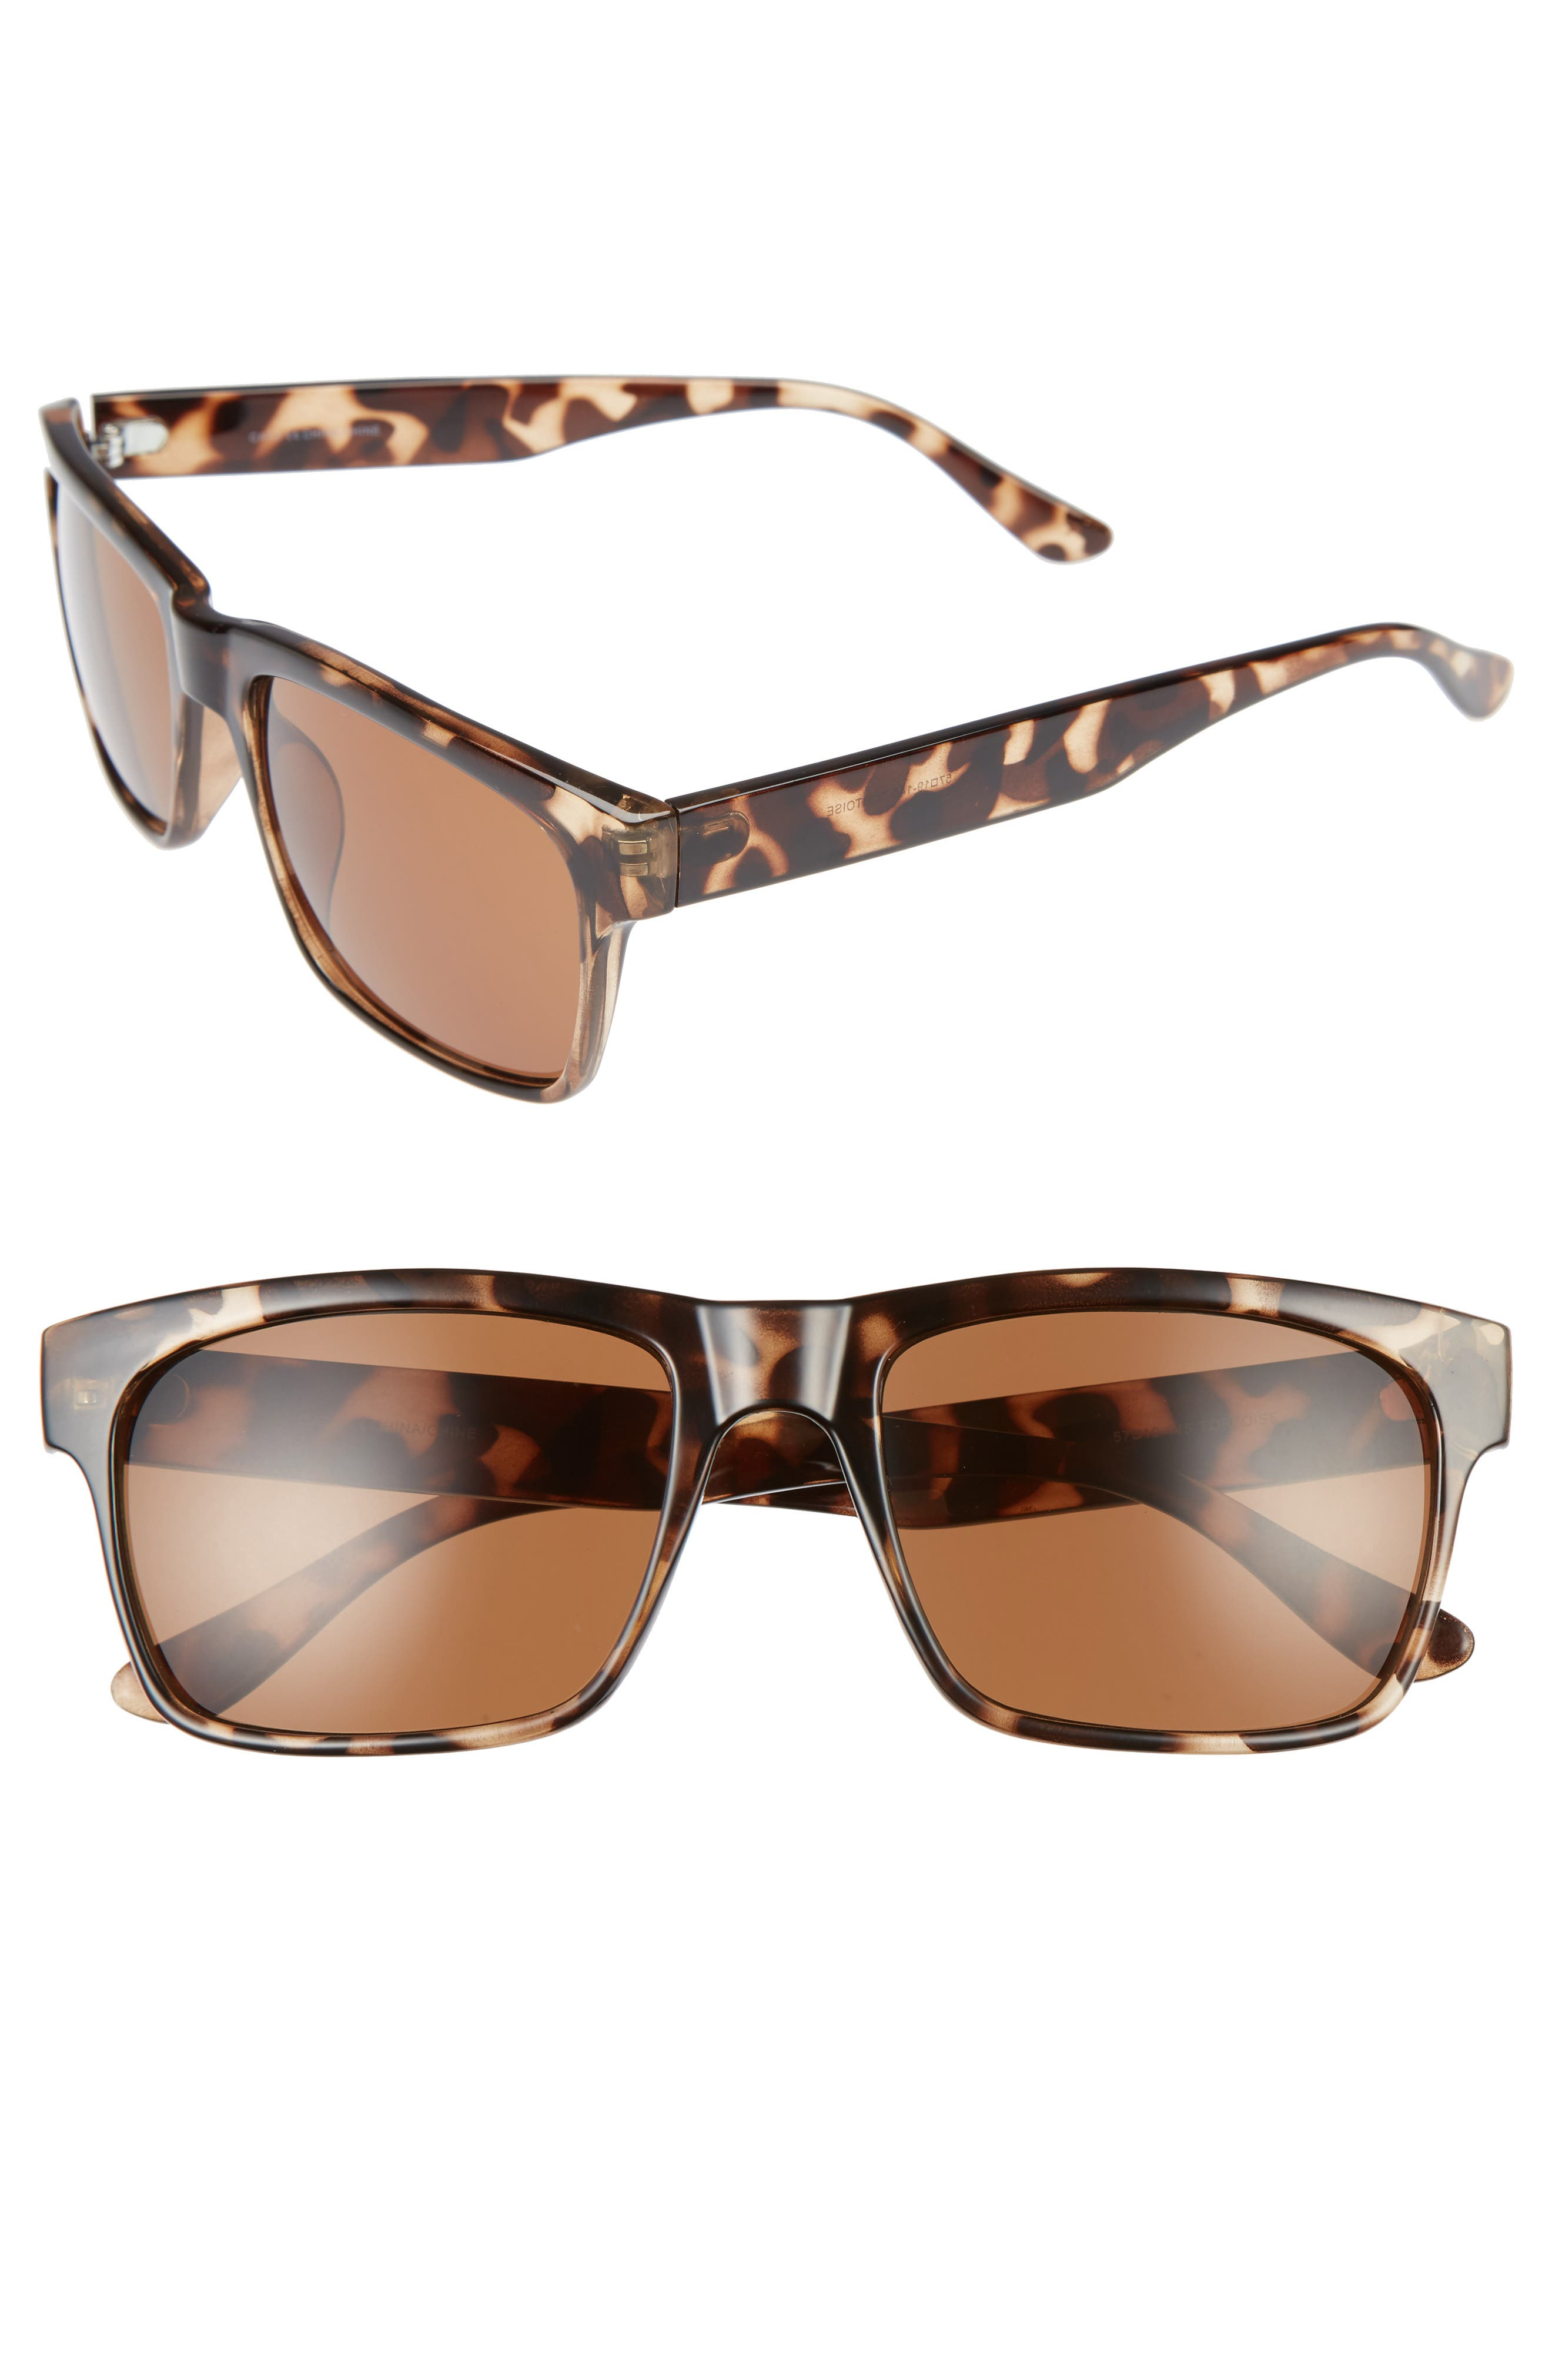 Hollis 57mm Sunglasses,                             Main thumbnail 1, color,                             TORTOISE/ BROWN